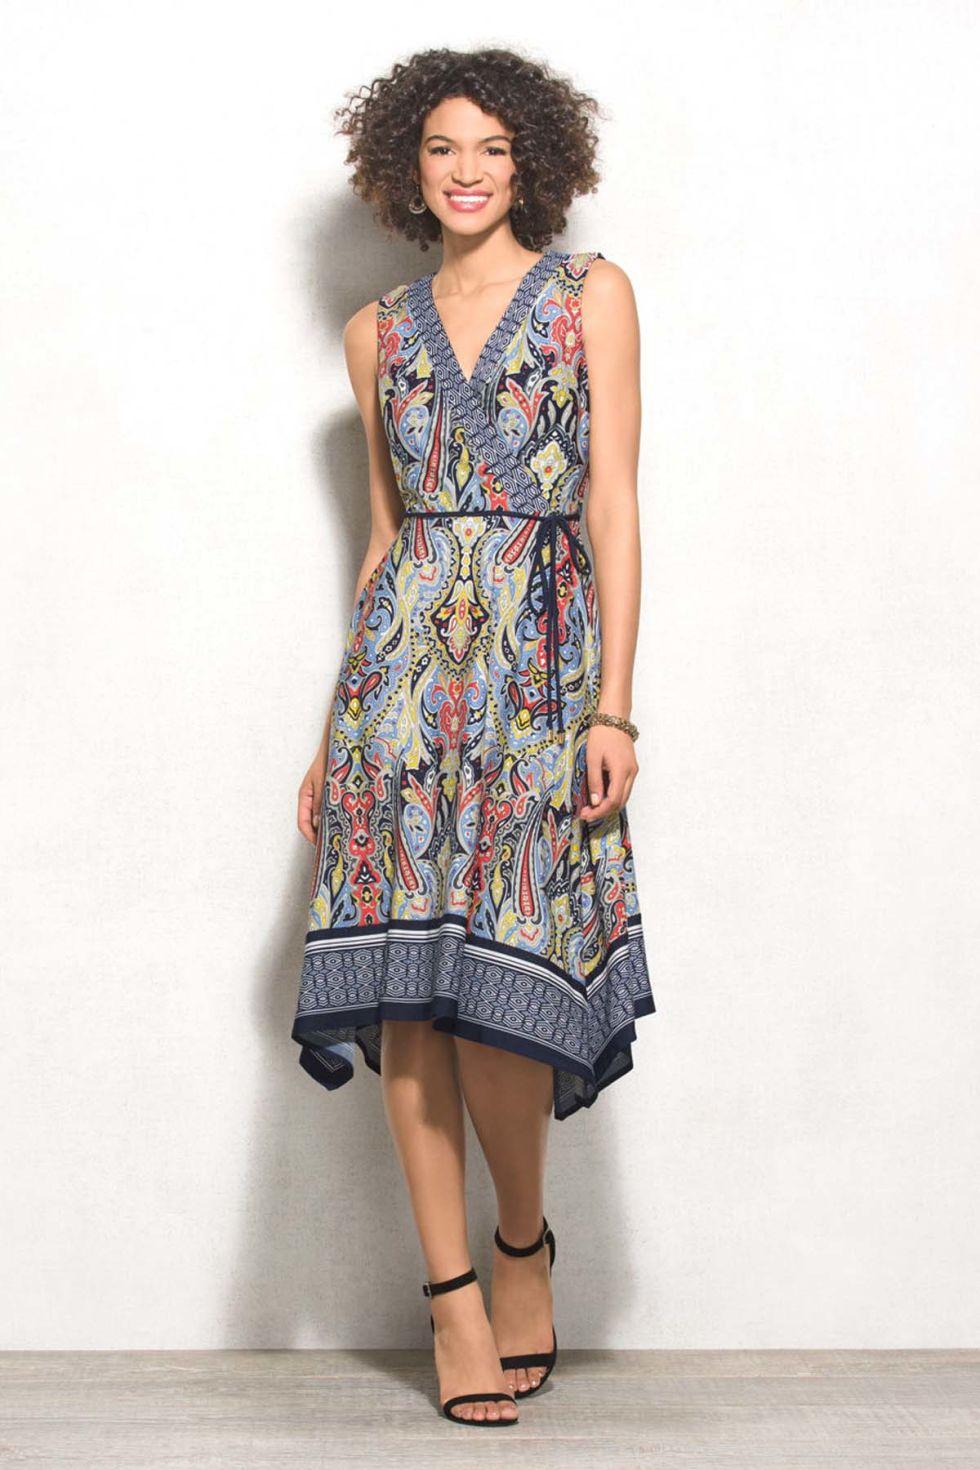 24 Cute Easter Dresses for Women - Cheap Ladies Easter Dresses ...